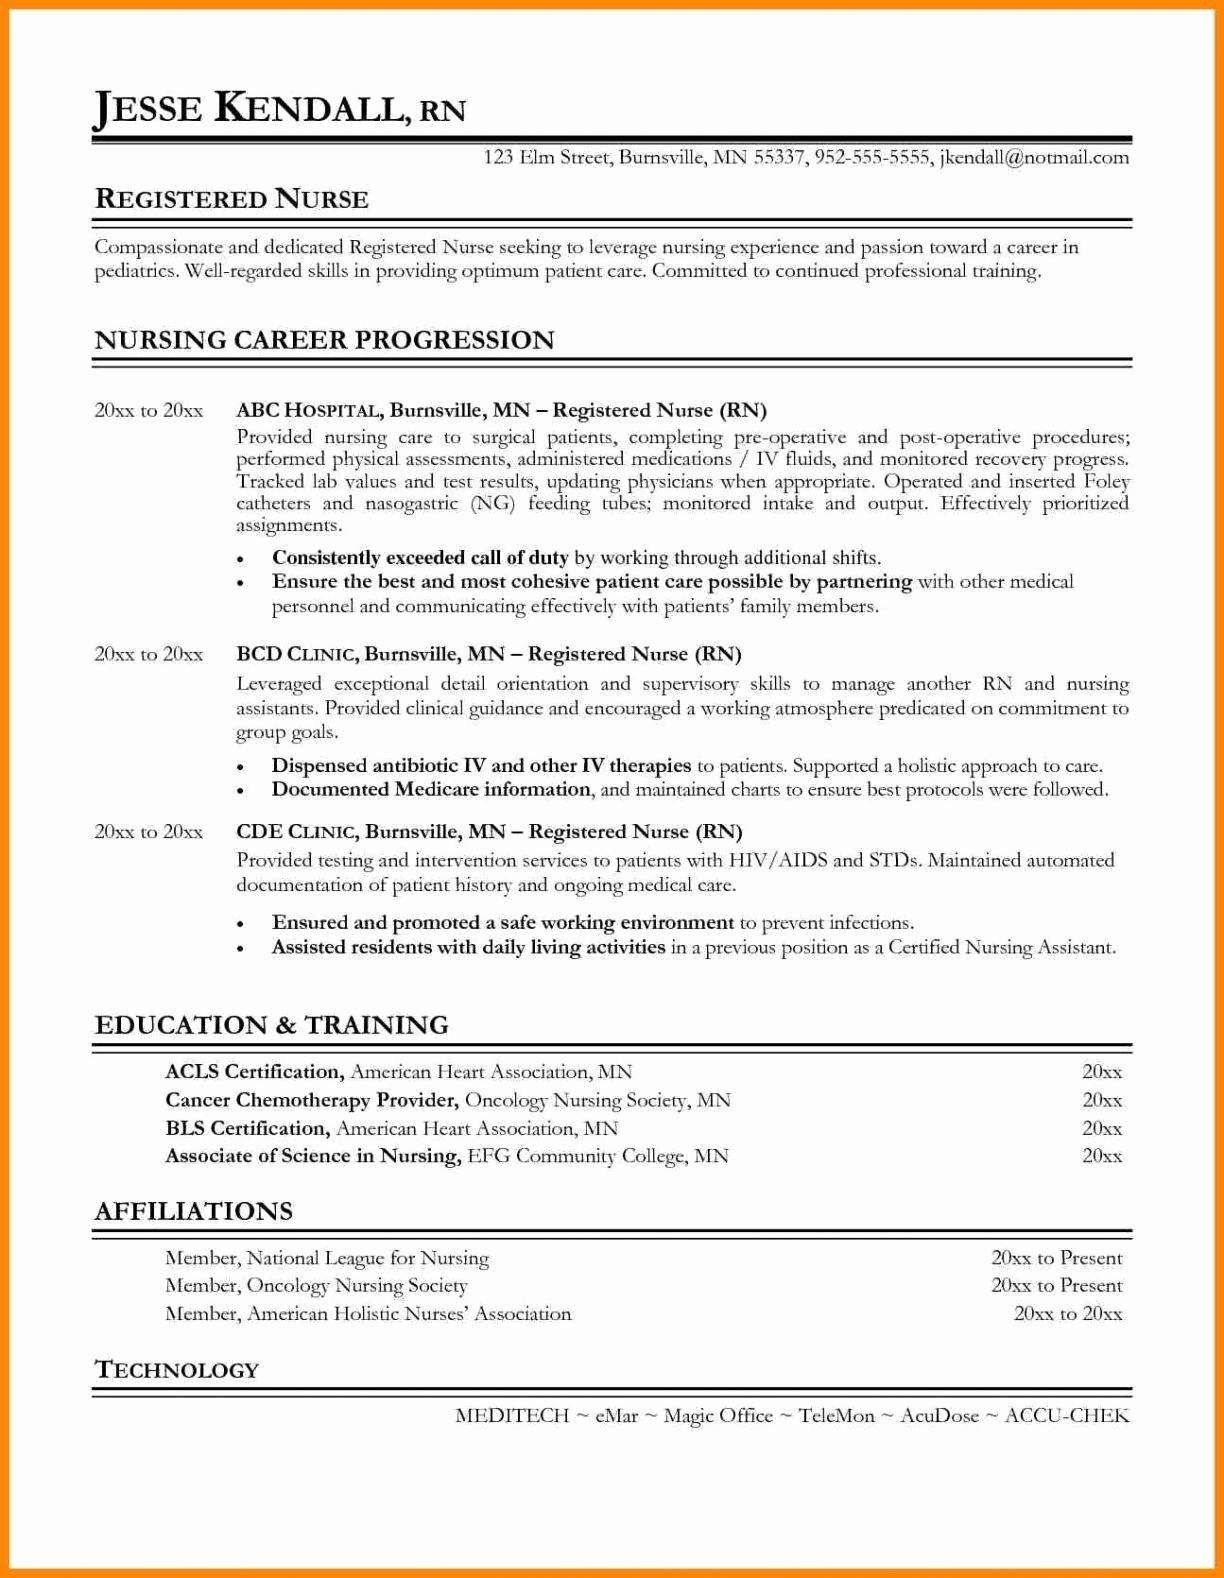 Things To Highlight On A Nurse Resume New Grad Nursing Resume Template Registered Nurse Resume Rn Resume